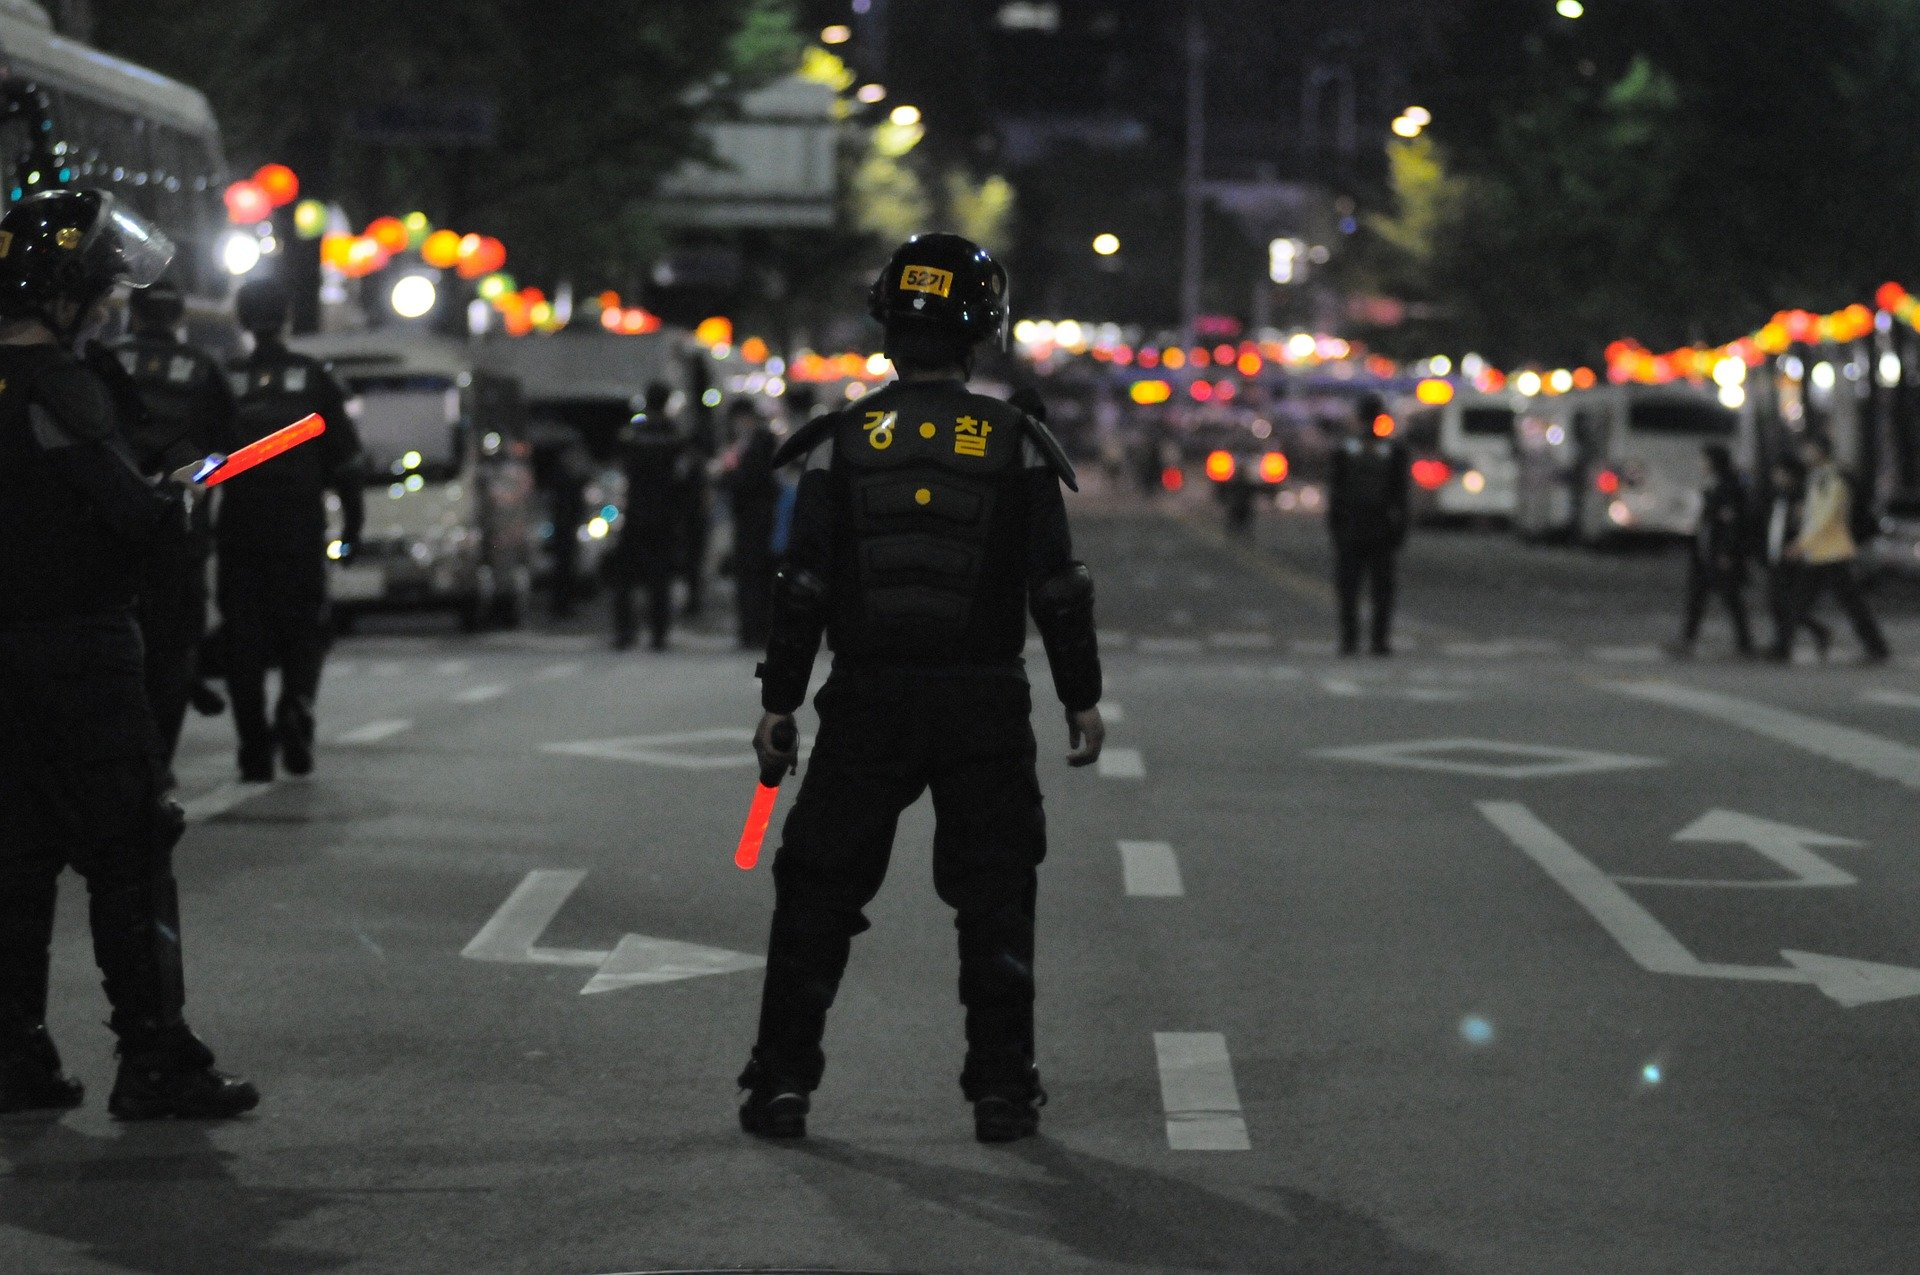 Republic of Korea riot police courtesy of pixabay